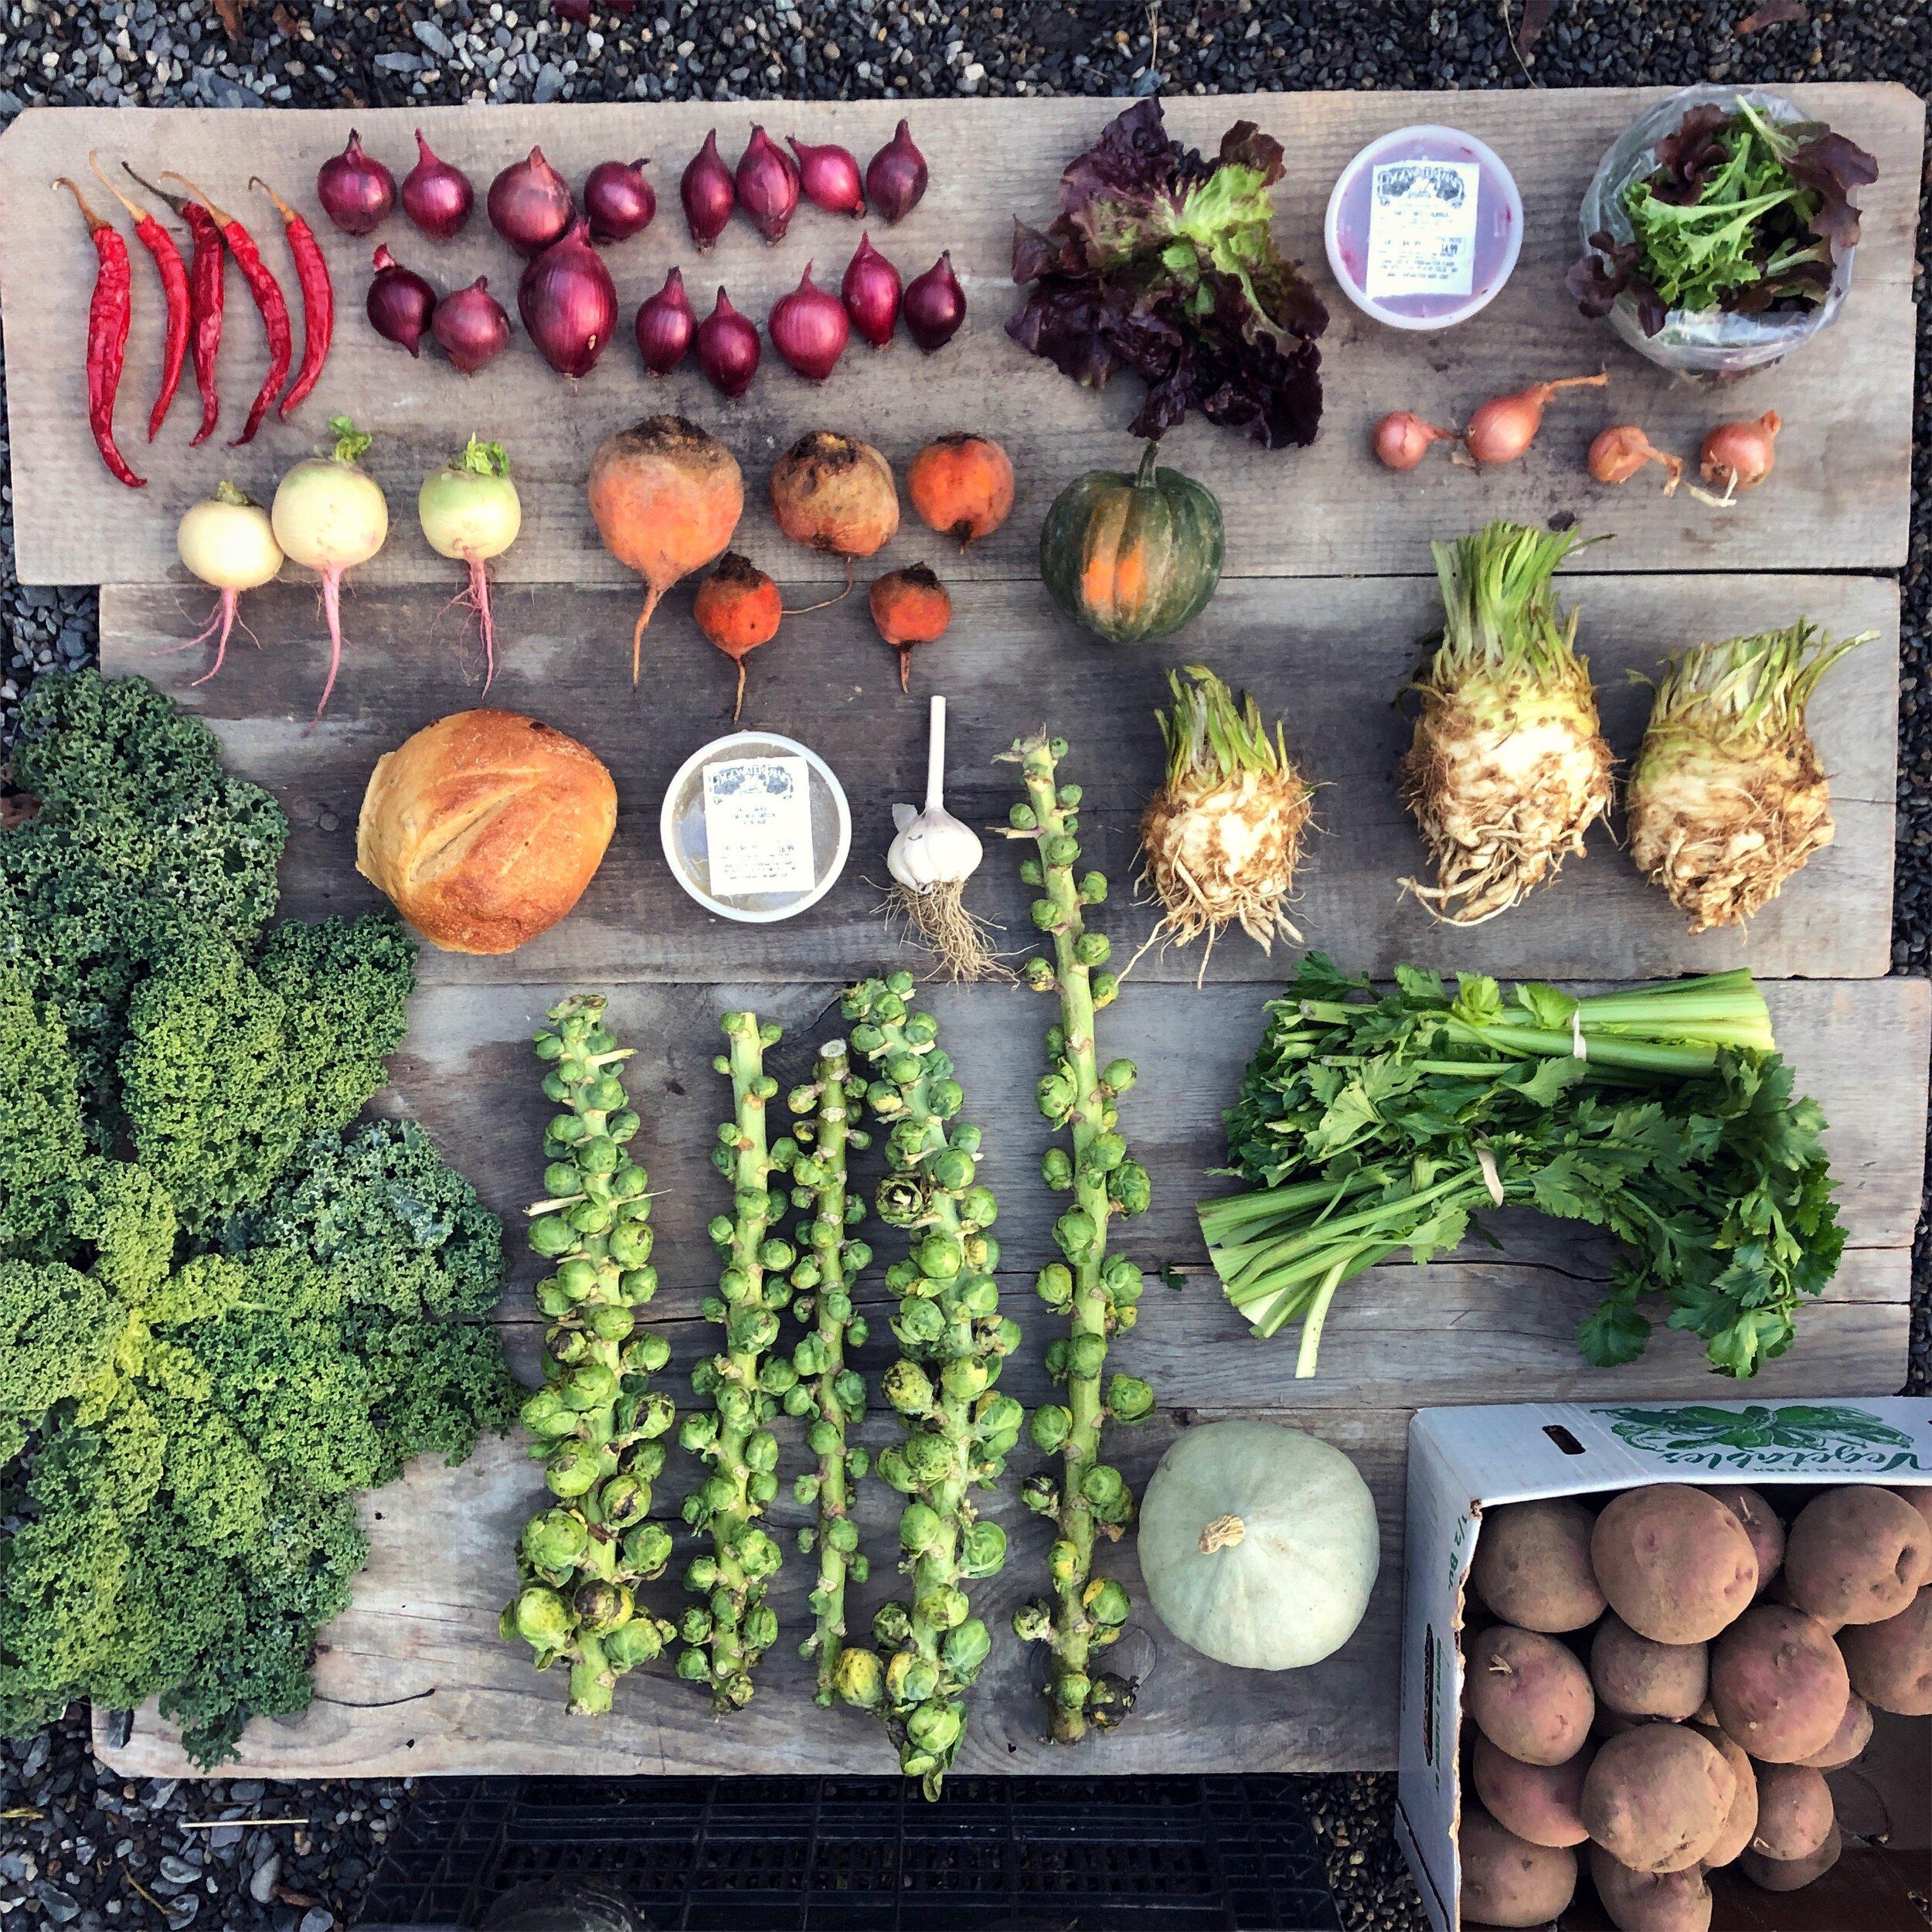 30  60 90 150 300 Grain White Eggplant Aubergine Organic Vegetables Seeds